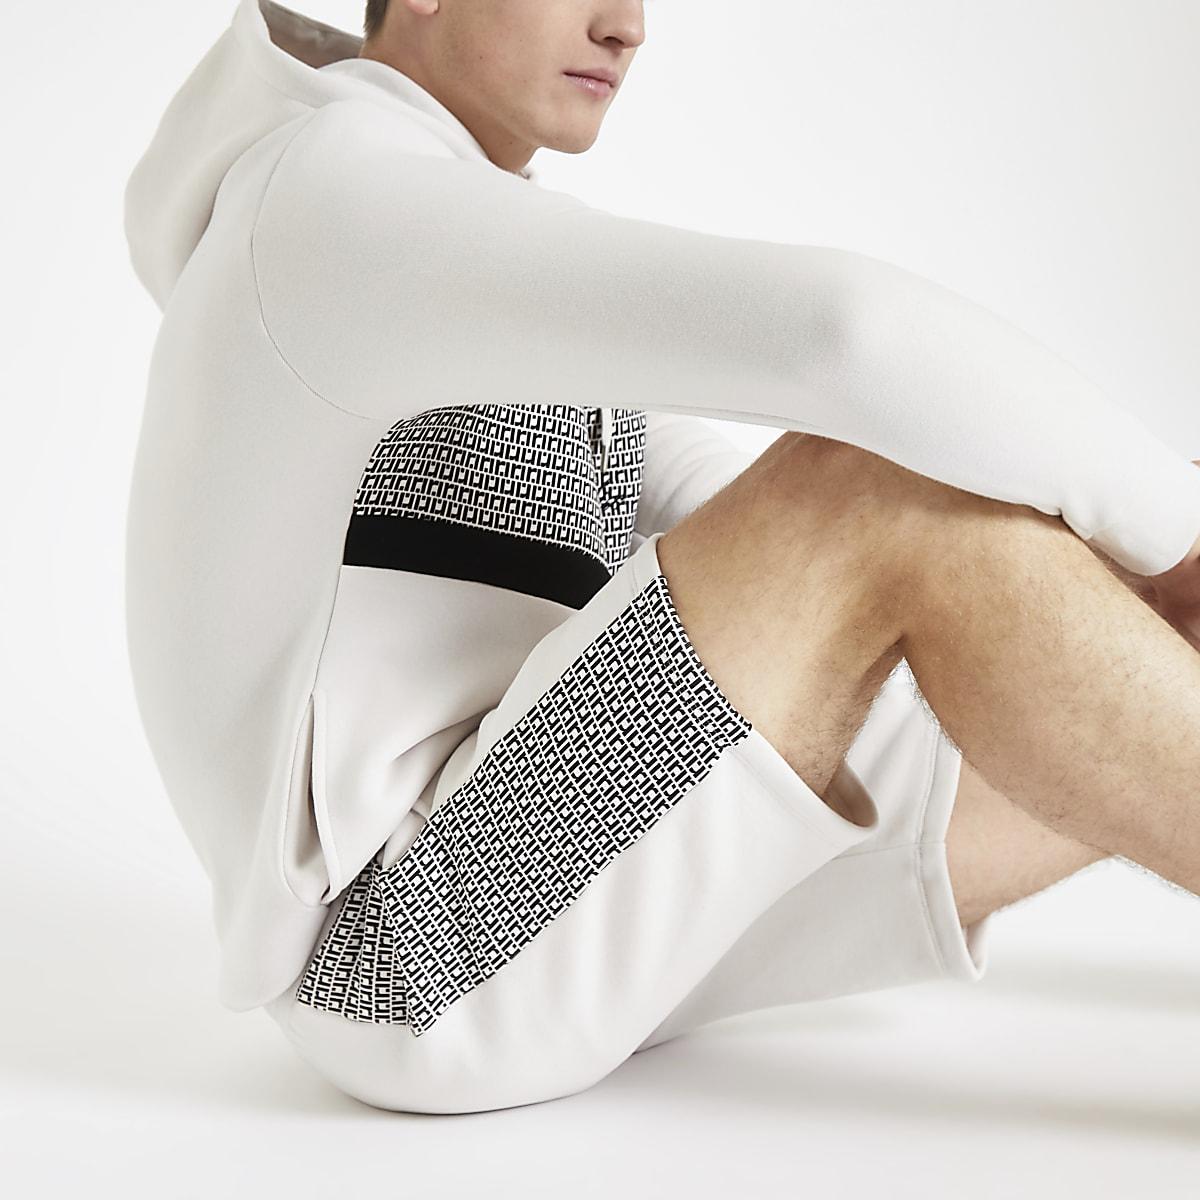 R96 stone RI monogram slim fit jersey shorts